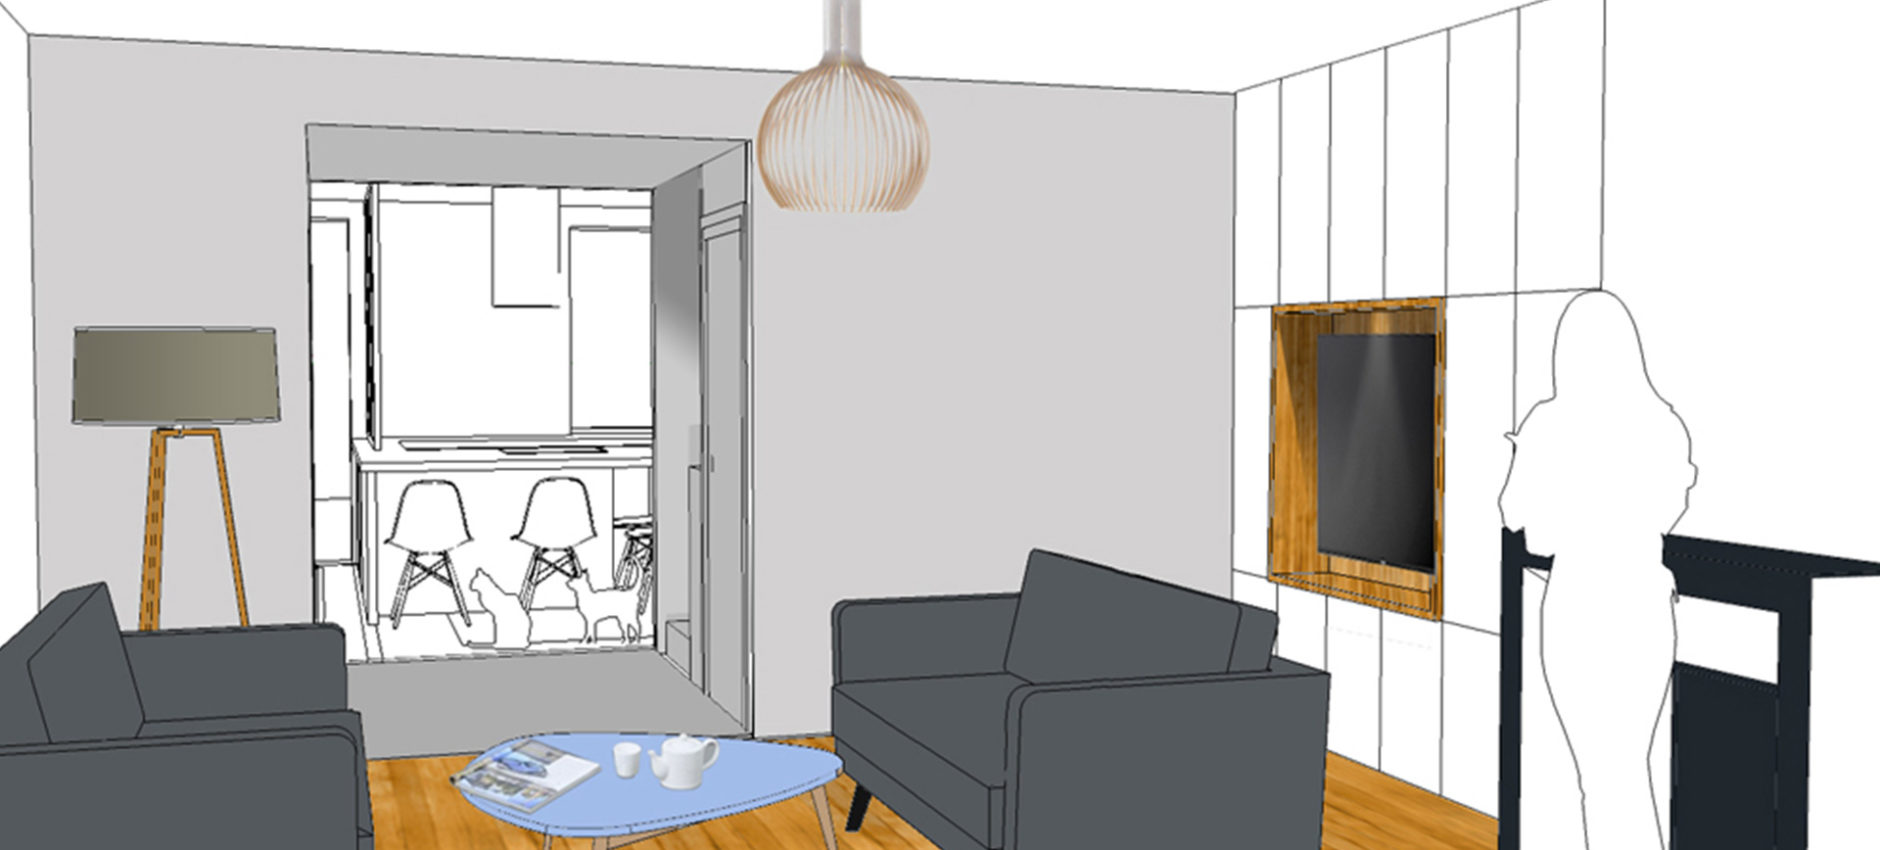 boca_architecture_projet_maison_AG_04.jpg